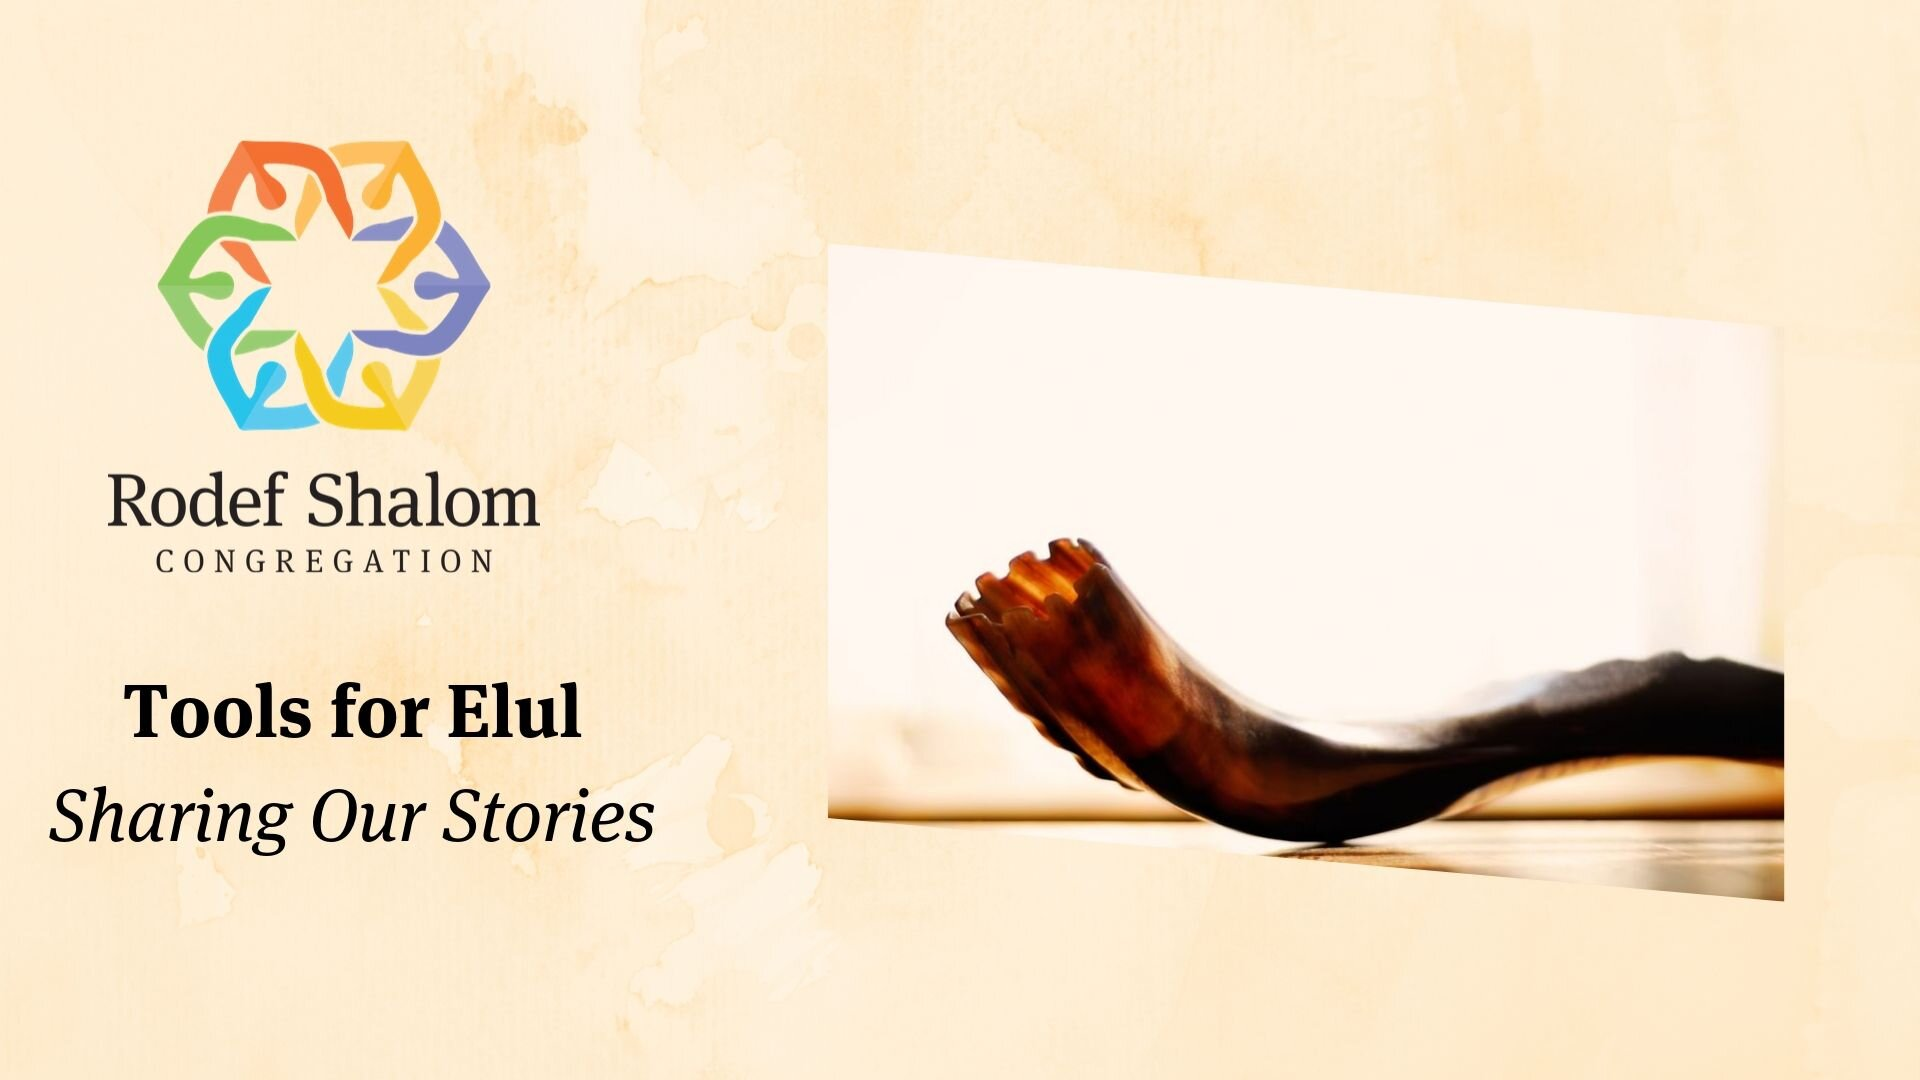 Tools for Elul Headers 8.27.19 (3).jpg